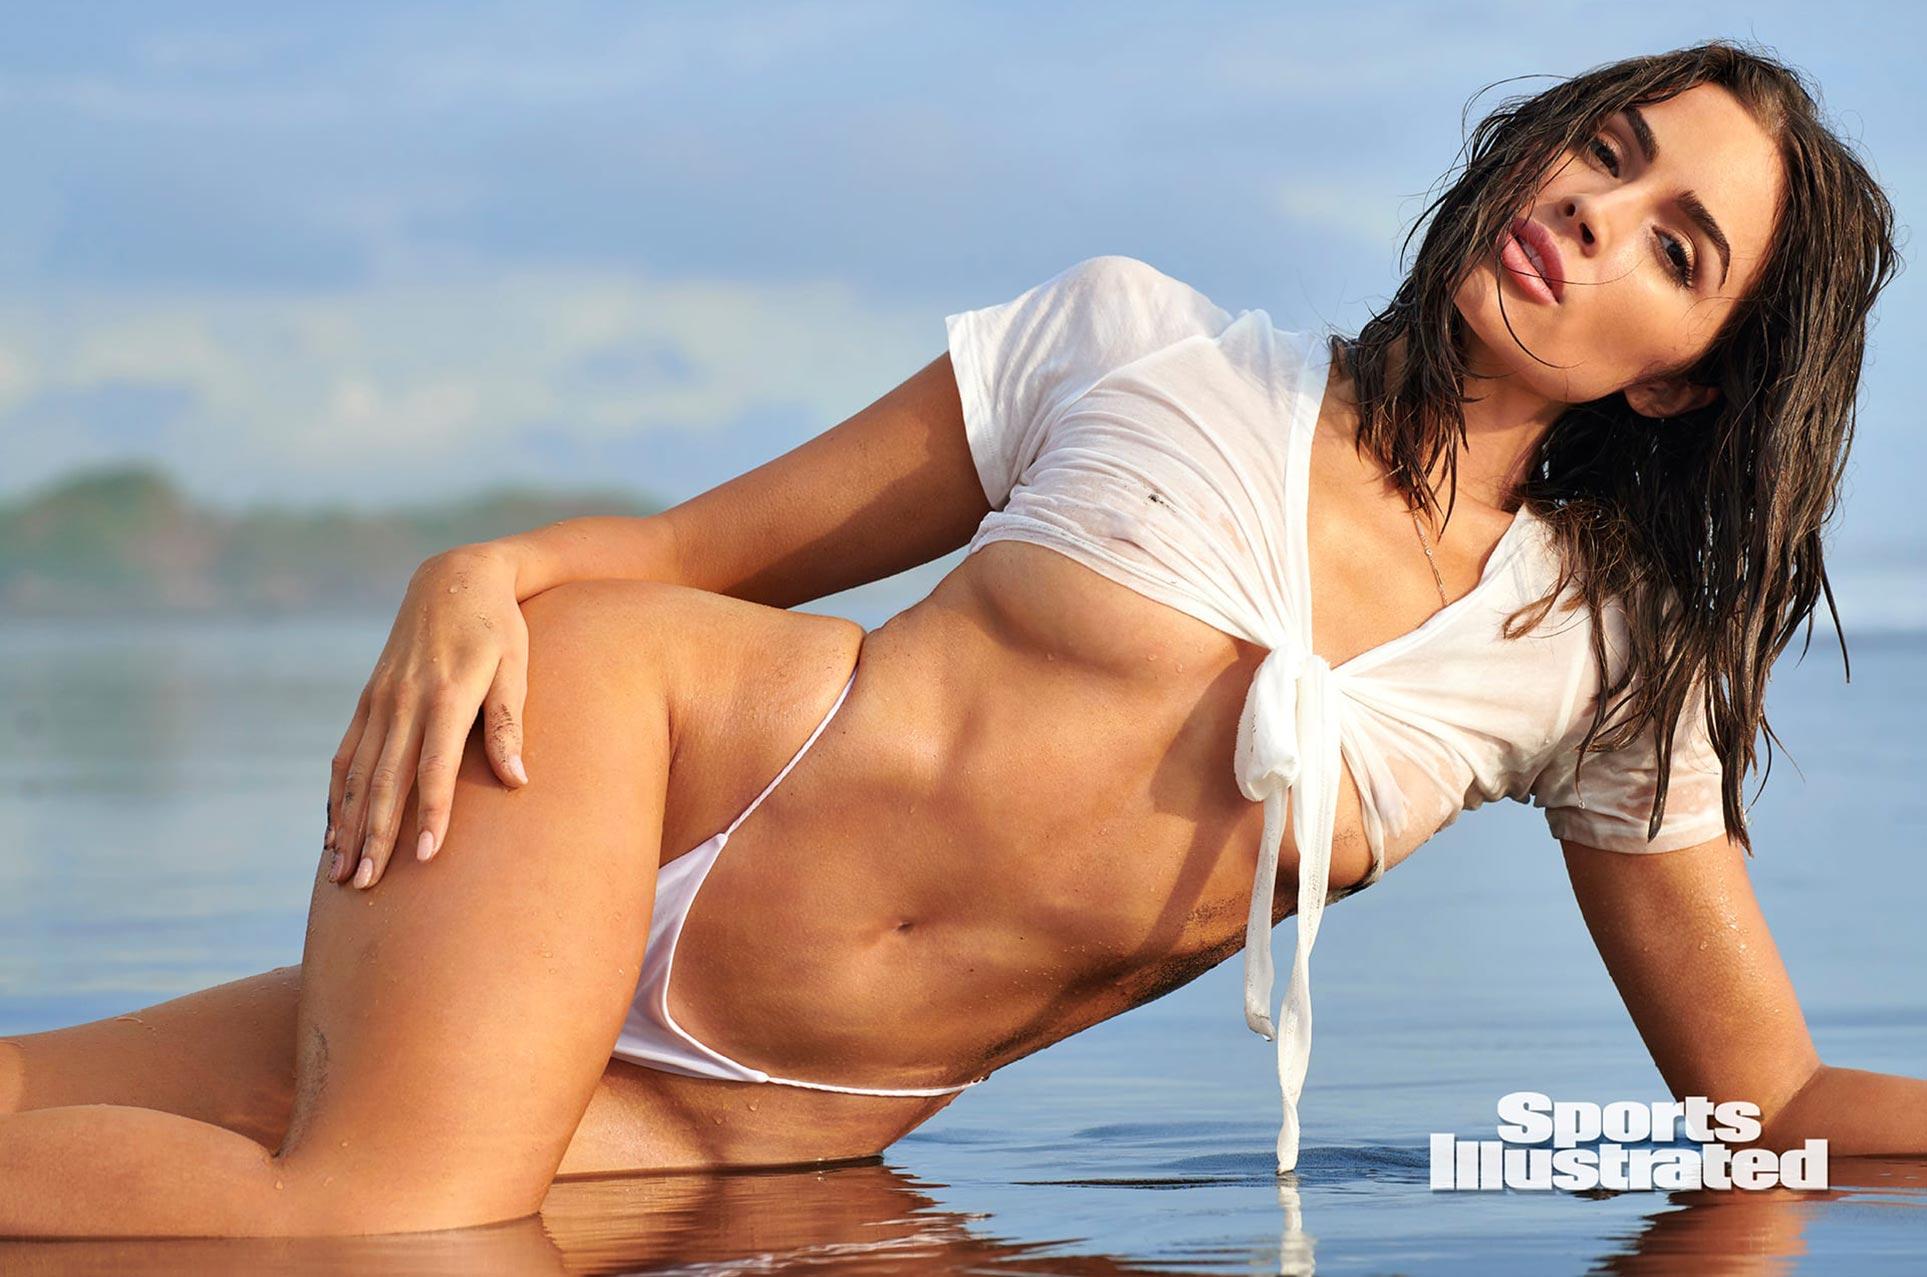 Оливия Калпо в каталоге купальников Sports Illustrated Swimsuit 2020 / фото 01